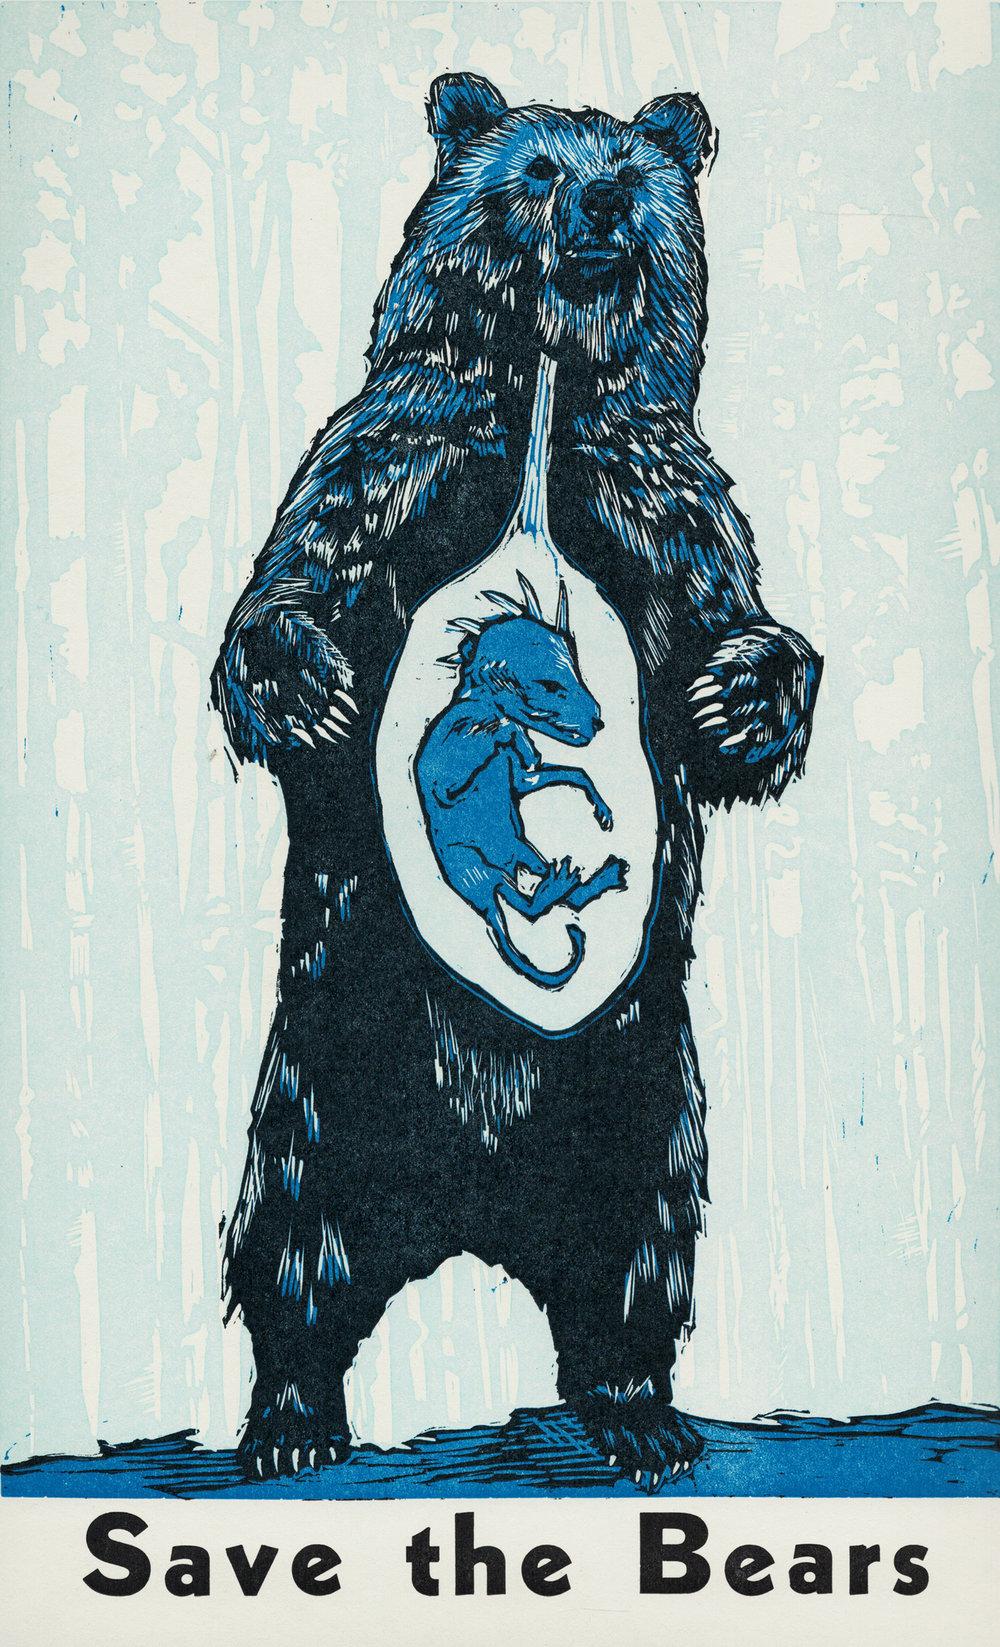 Save the Bears